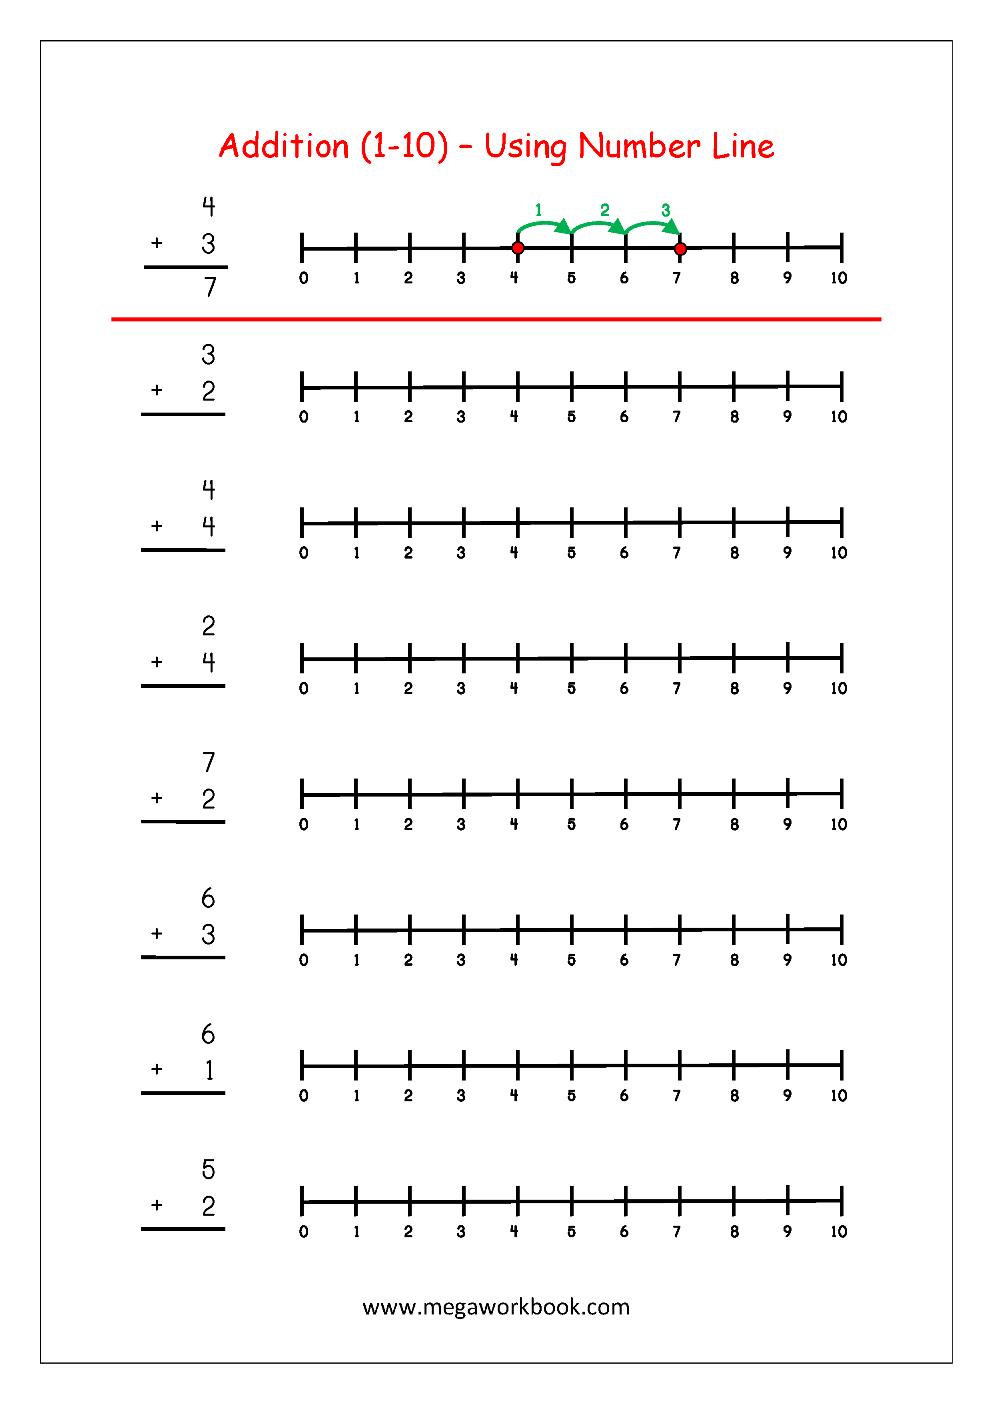 Free Printable Number Addition Worksheets (1-10) For Kindergarten - Free Printable Number Line